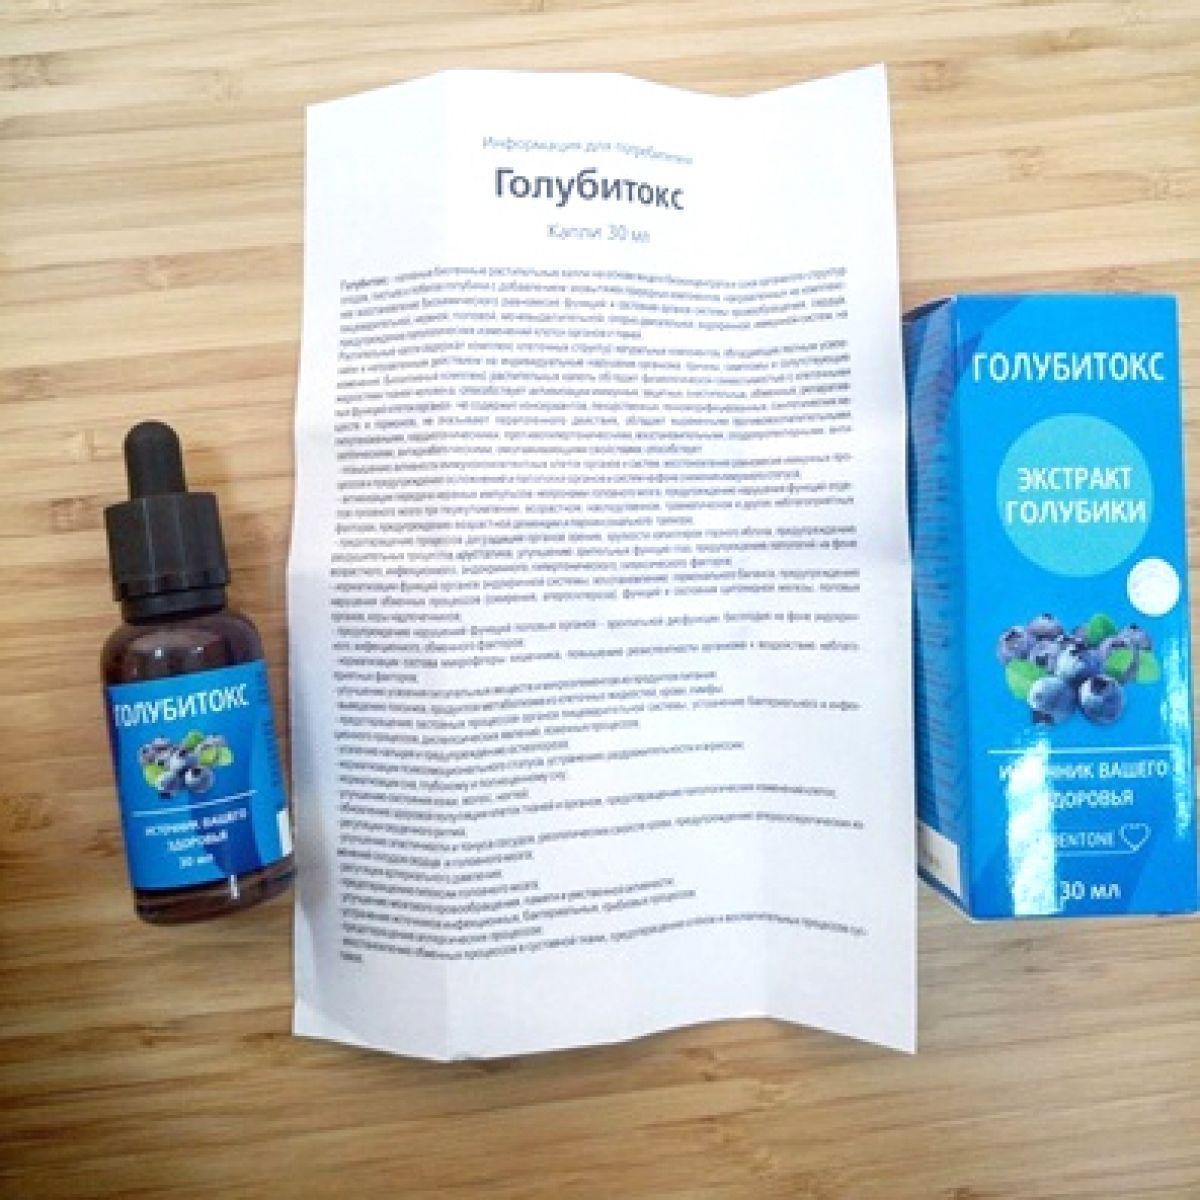 уренол лекарство от простатита